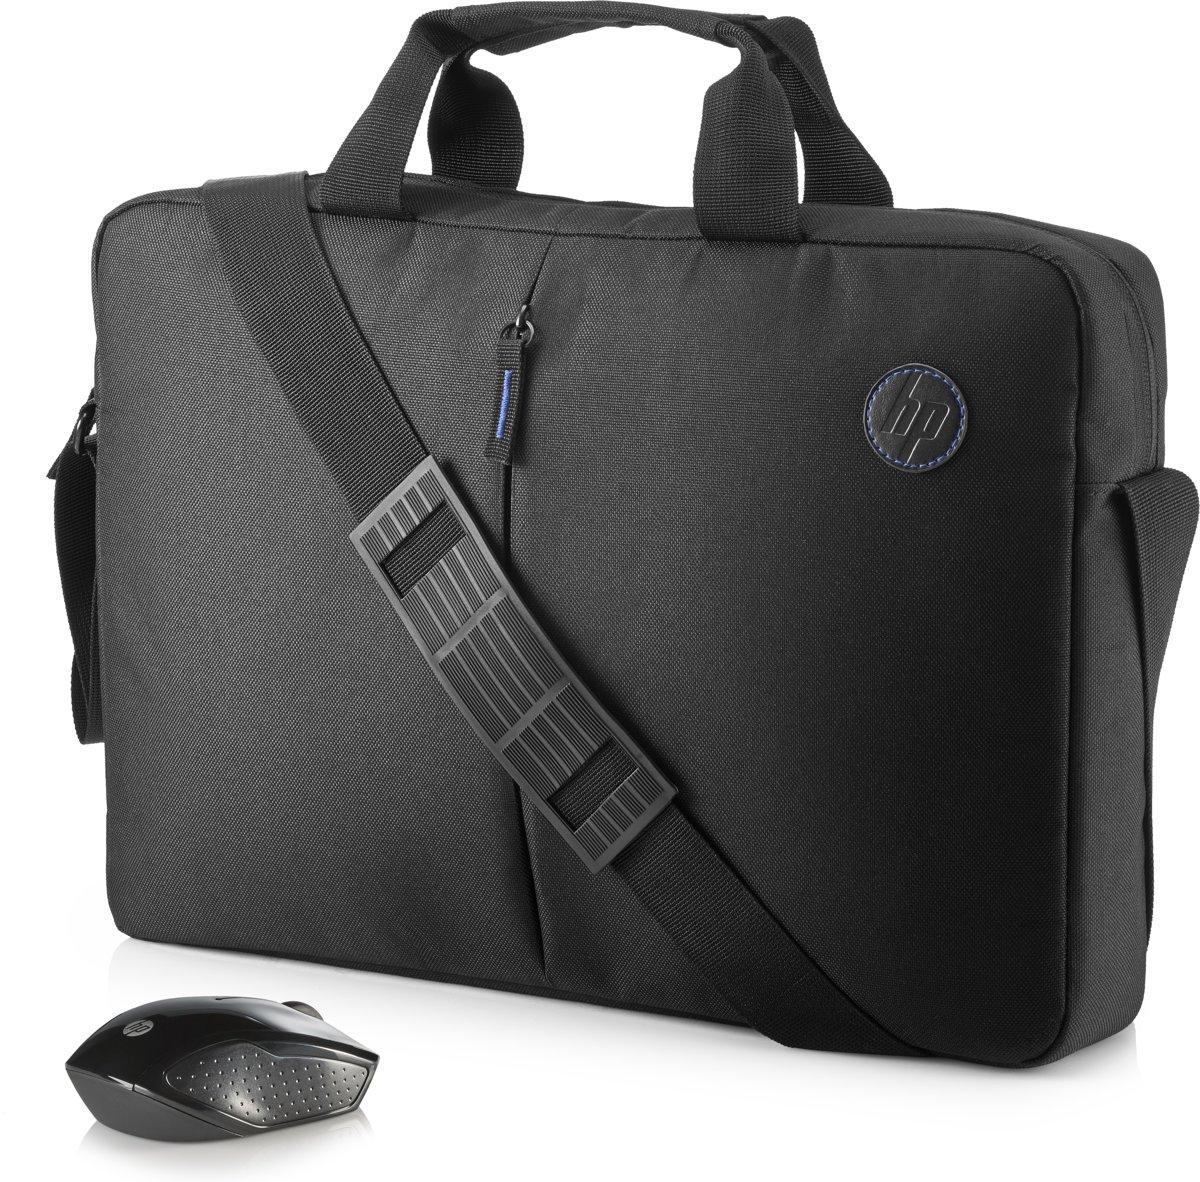 HP Value laptoptas incl. draadloze muis voor €7,99 @ Bol.com